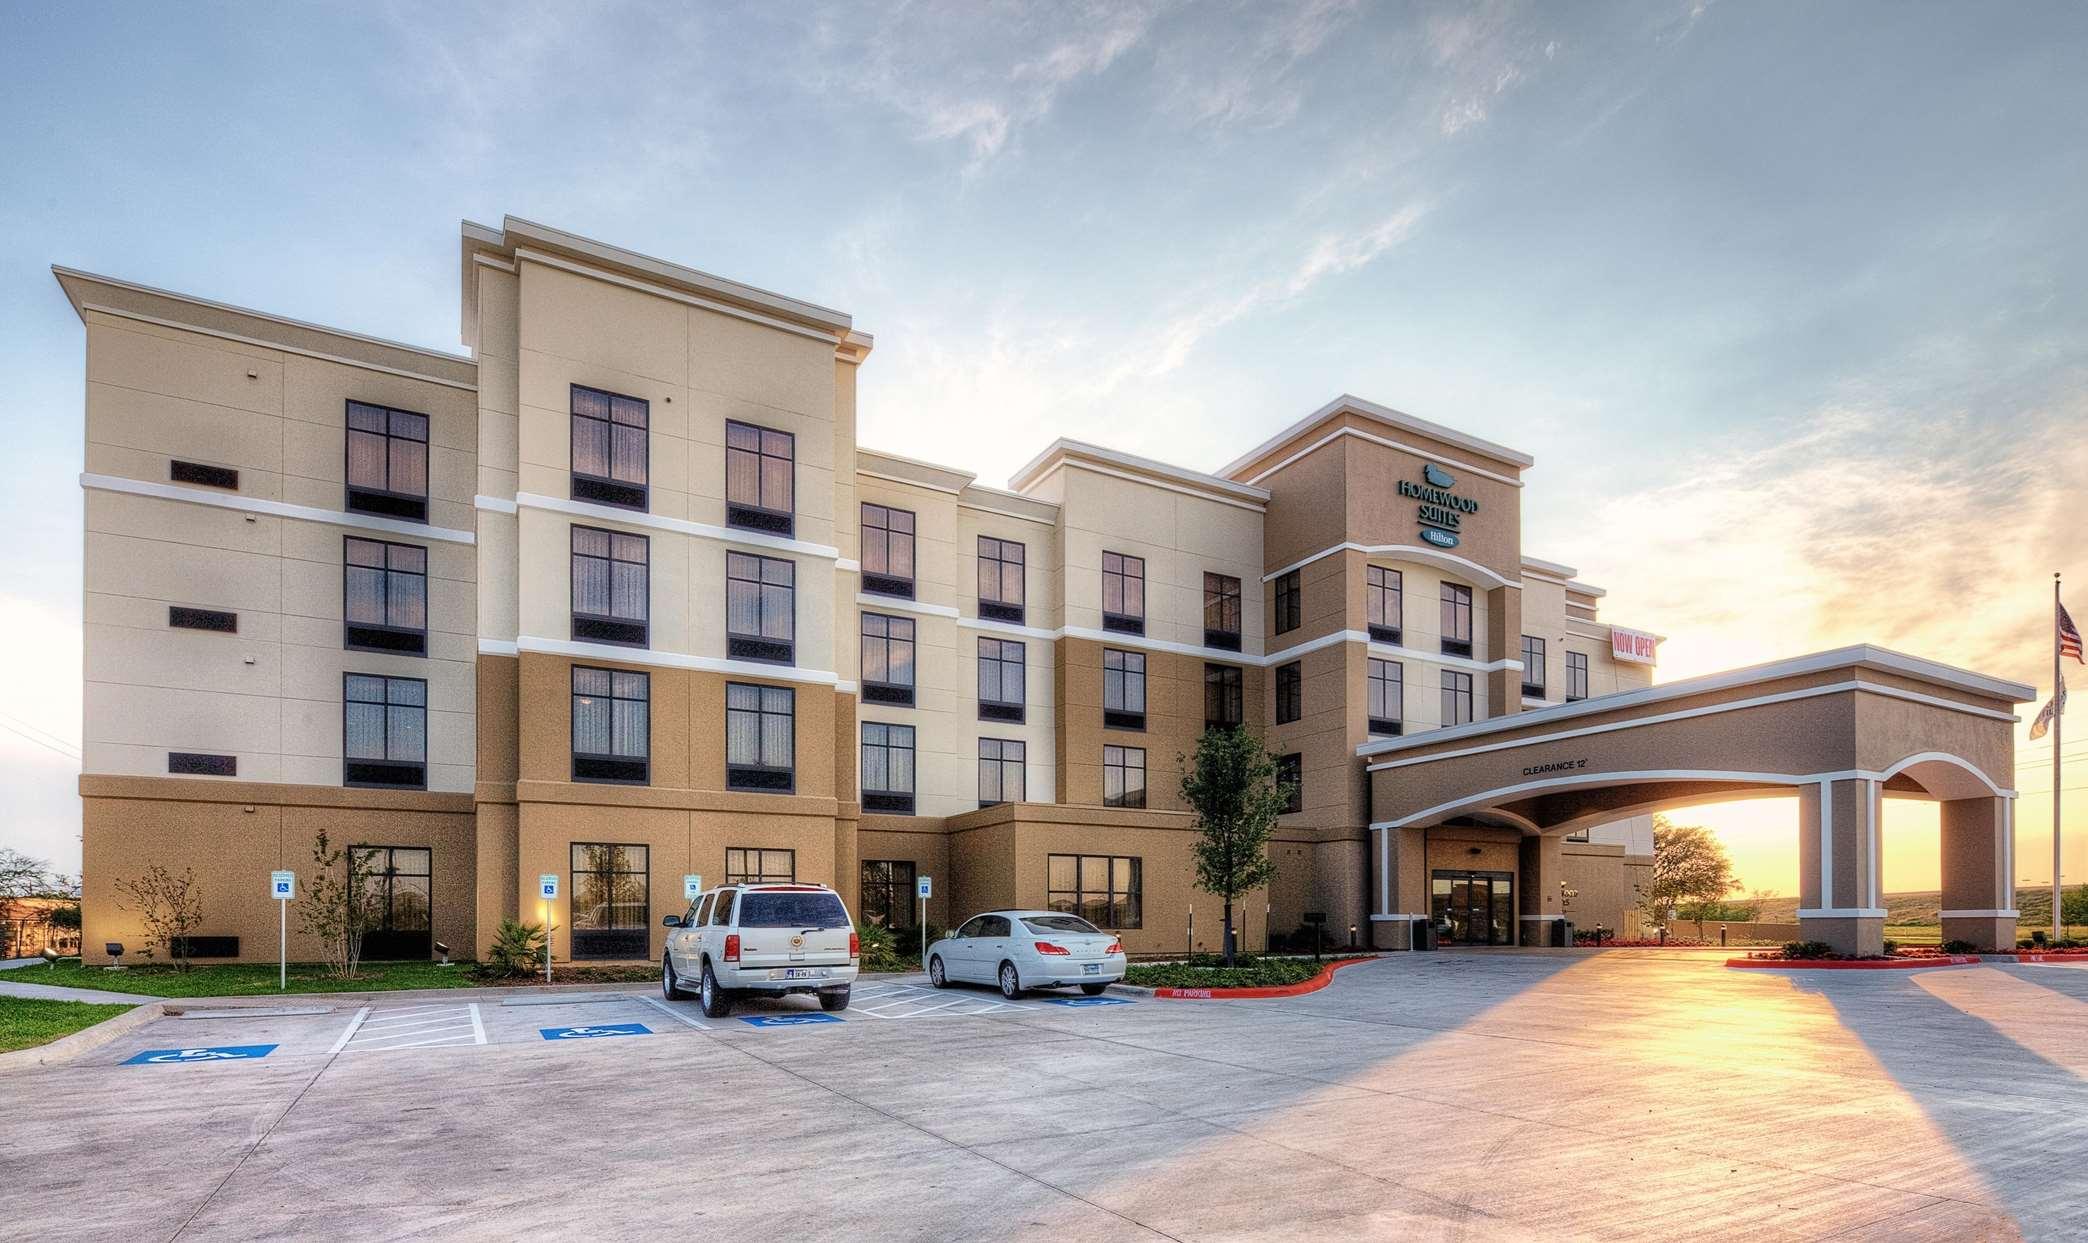 Homewood Suites by Hilton Victoria, TX image 1